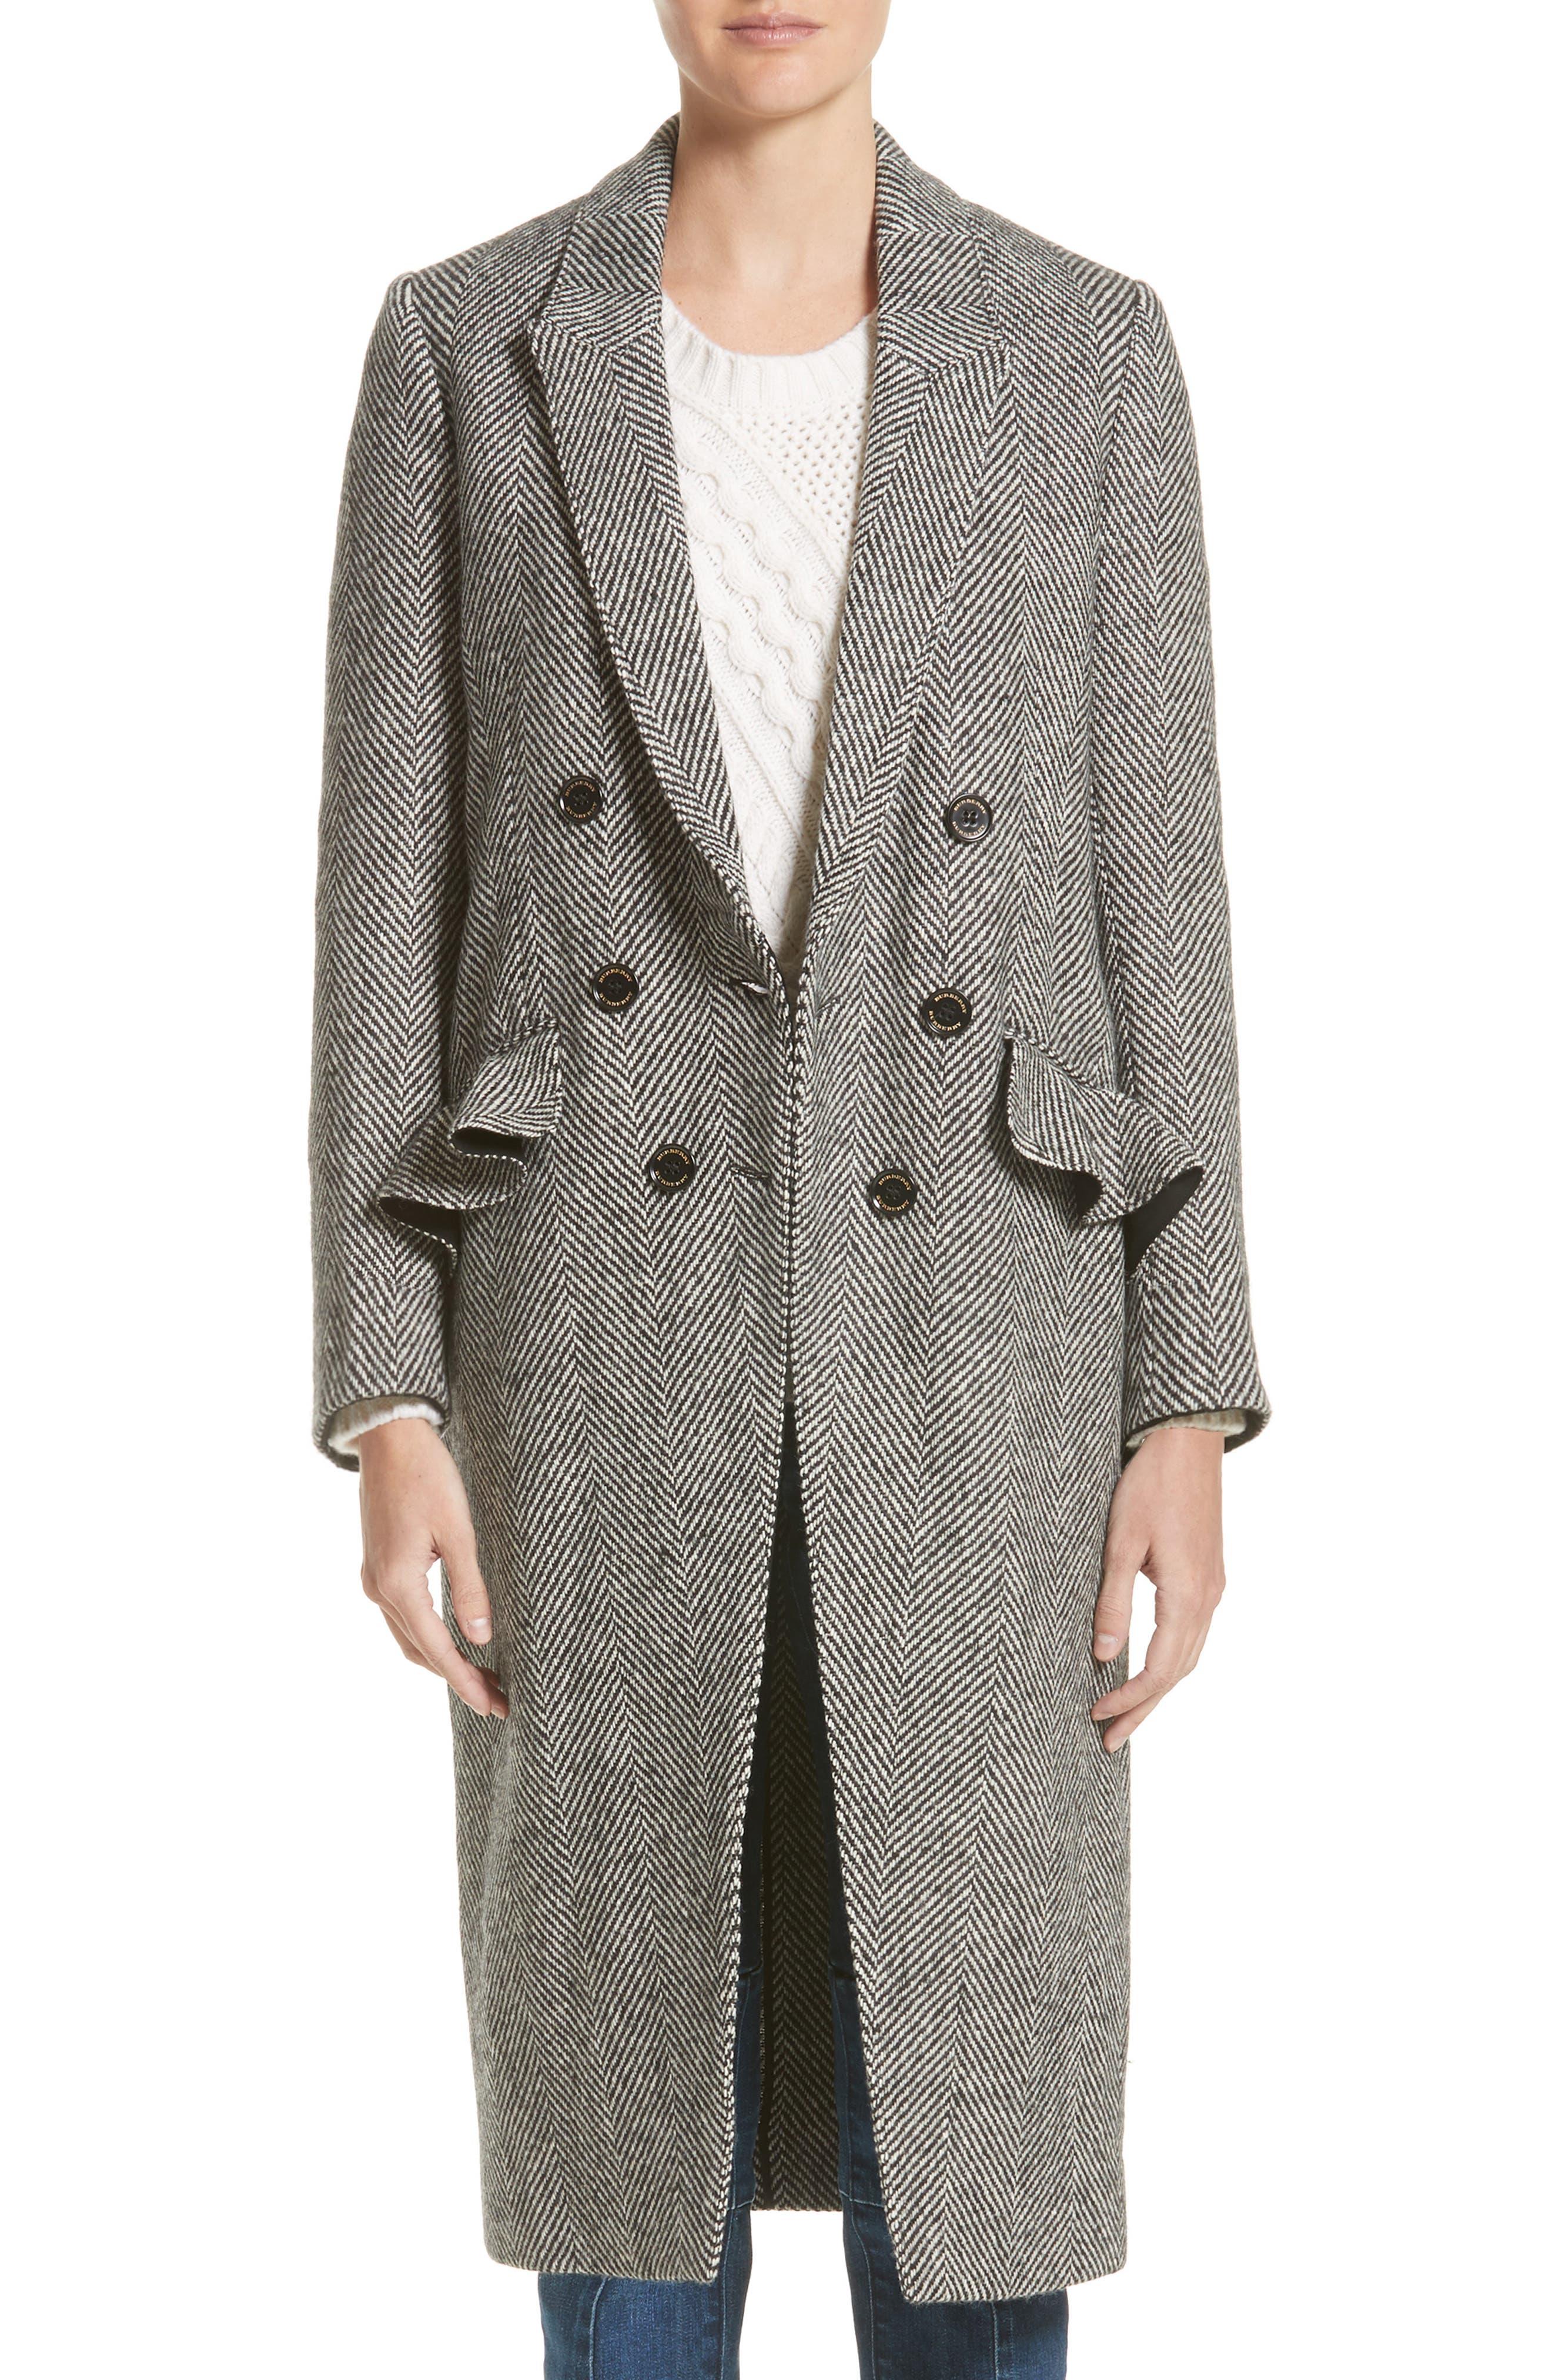 Burberry Trentwood Double Breasted Herringbone Wool Coat